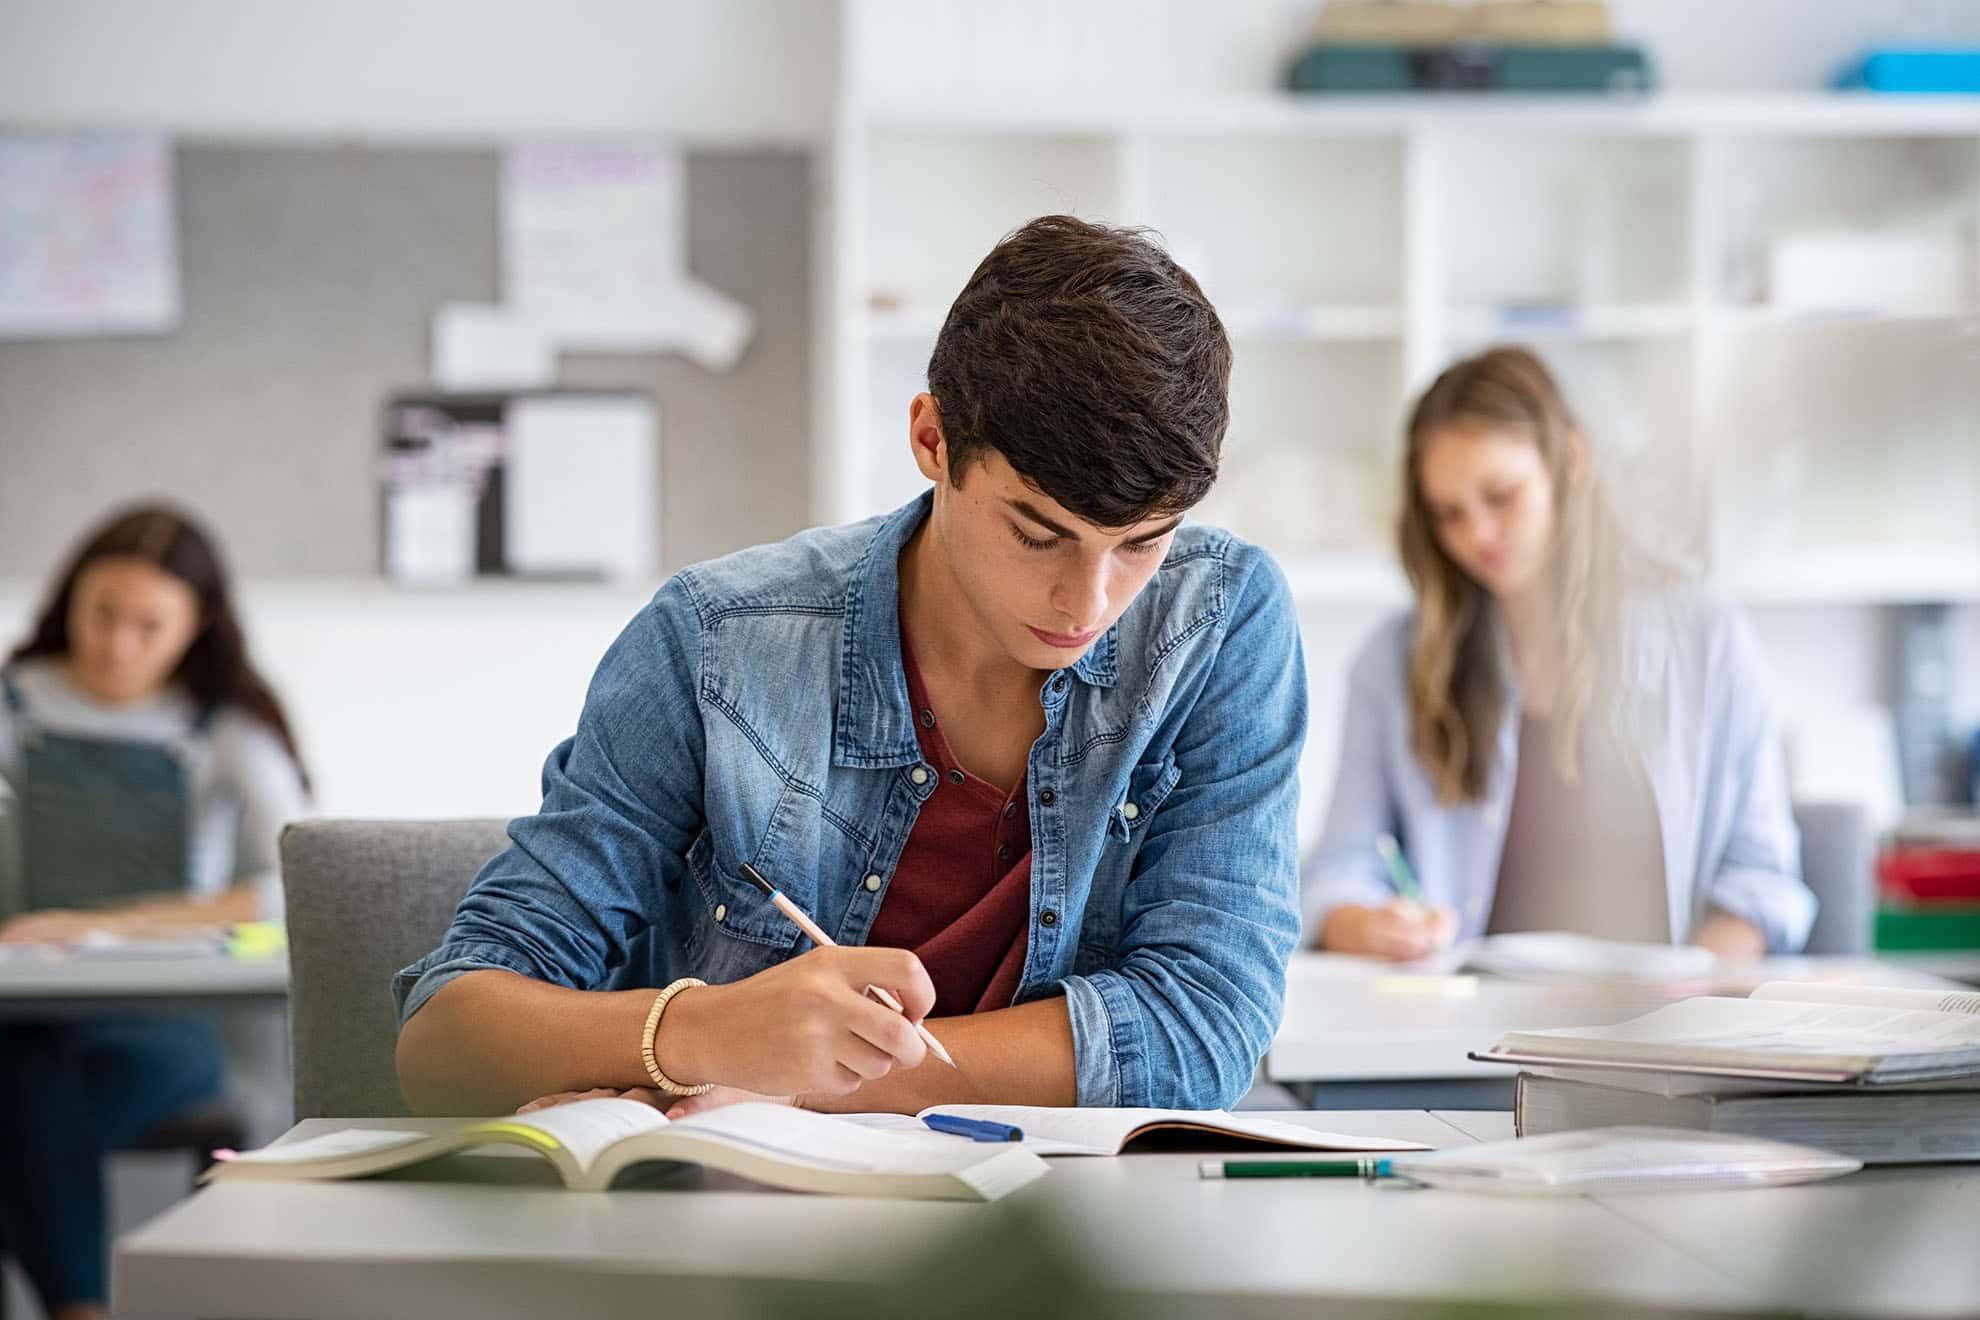 teen-student-studying-in-classroom-6PLDG64-min